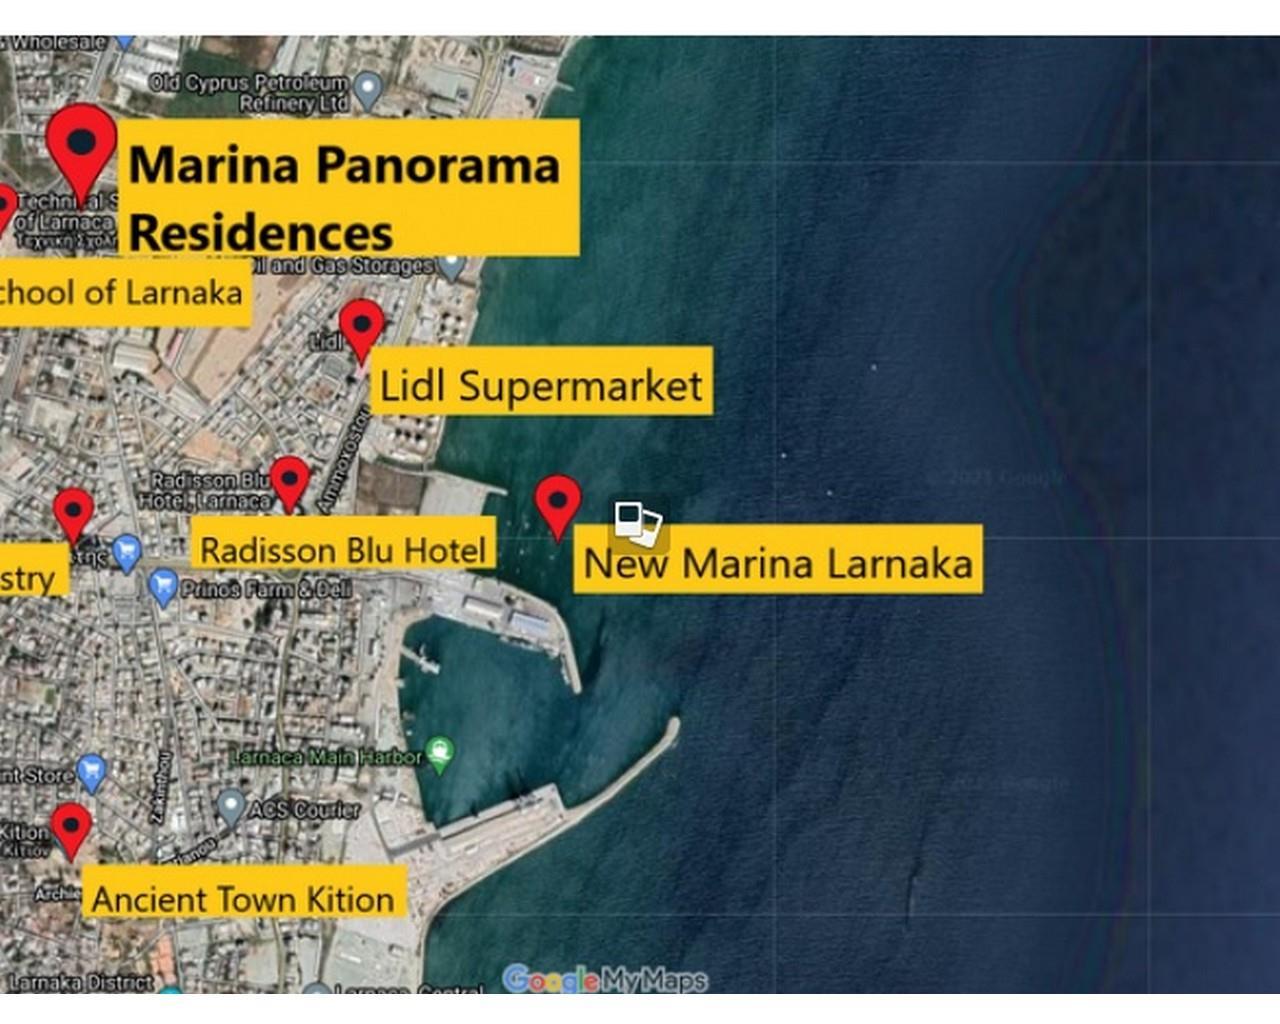 Apartment Larnaca(Larnaca)  3 Bedrooms 2 Bathrooms 101 SqMt.....